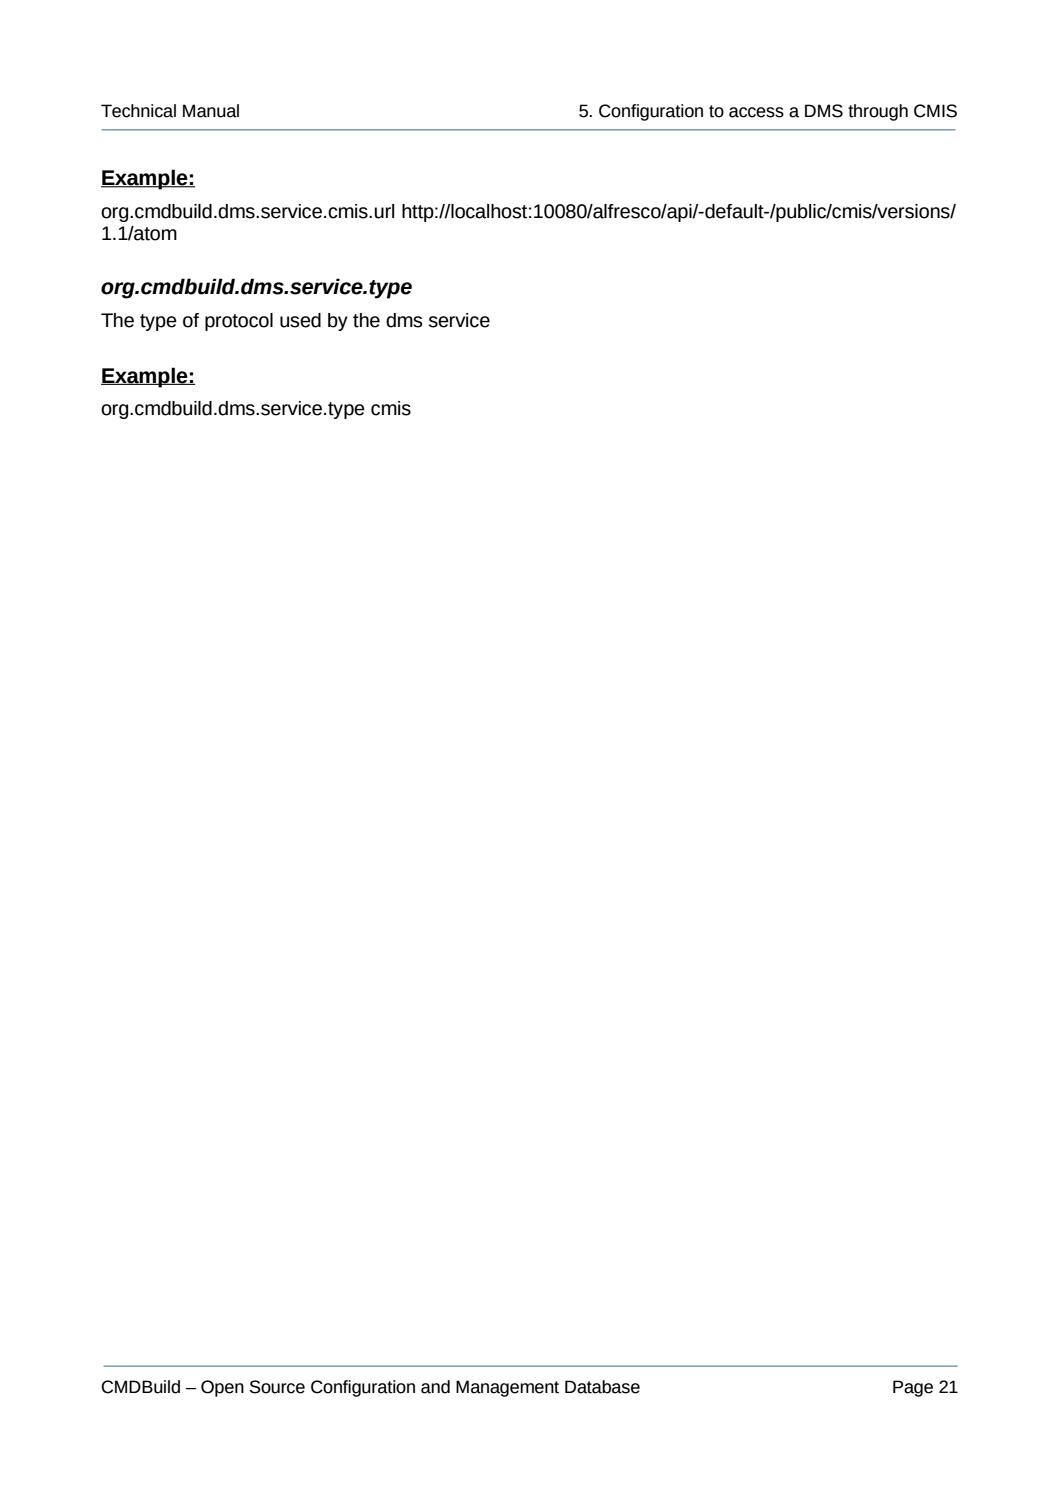 English CMDBuild Technical Manual by Tecnoteca srl - issuu